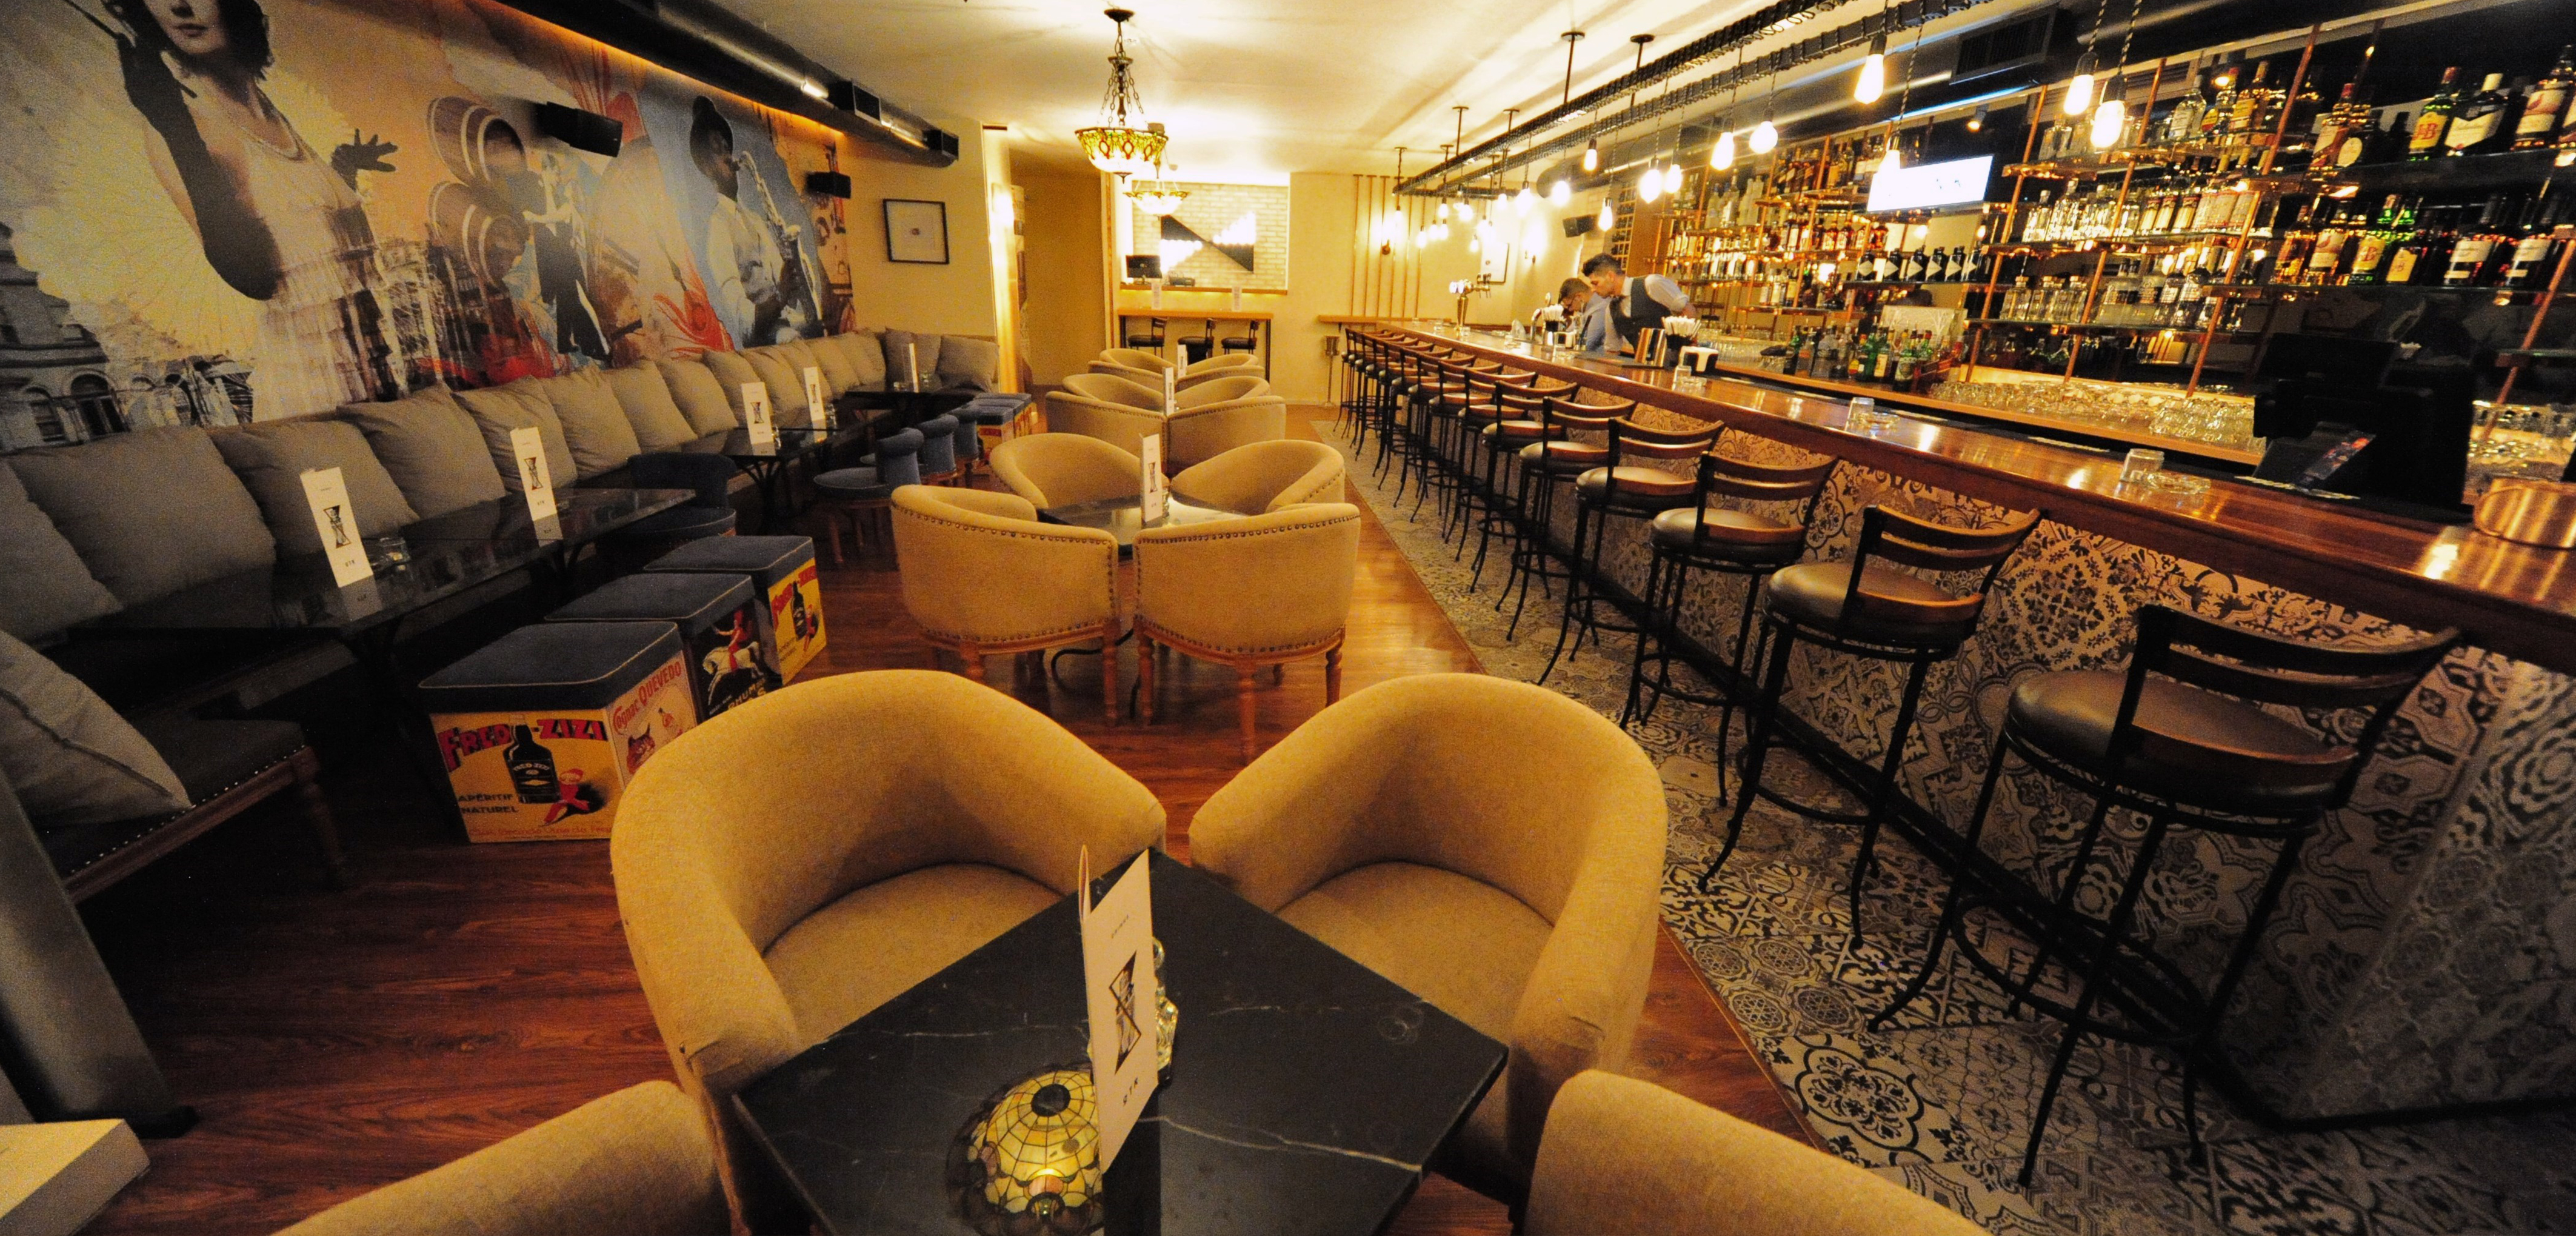 OTR lounge and pub at the conroy boutique hotel amman jordan